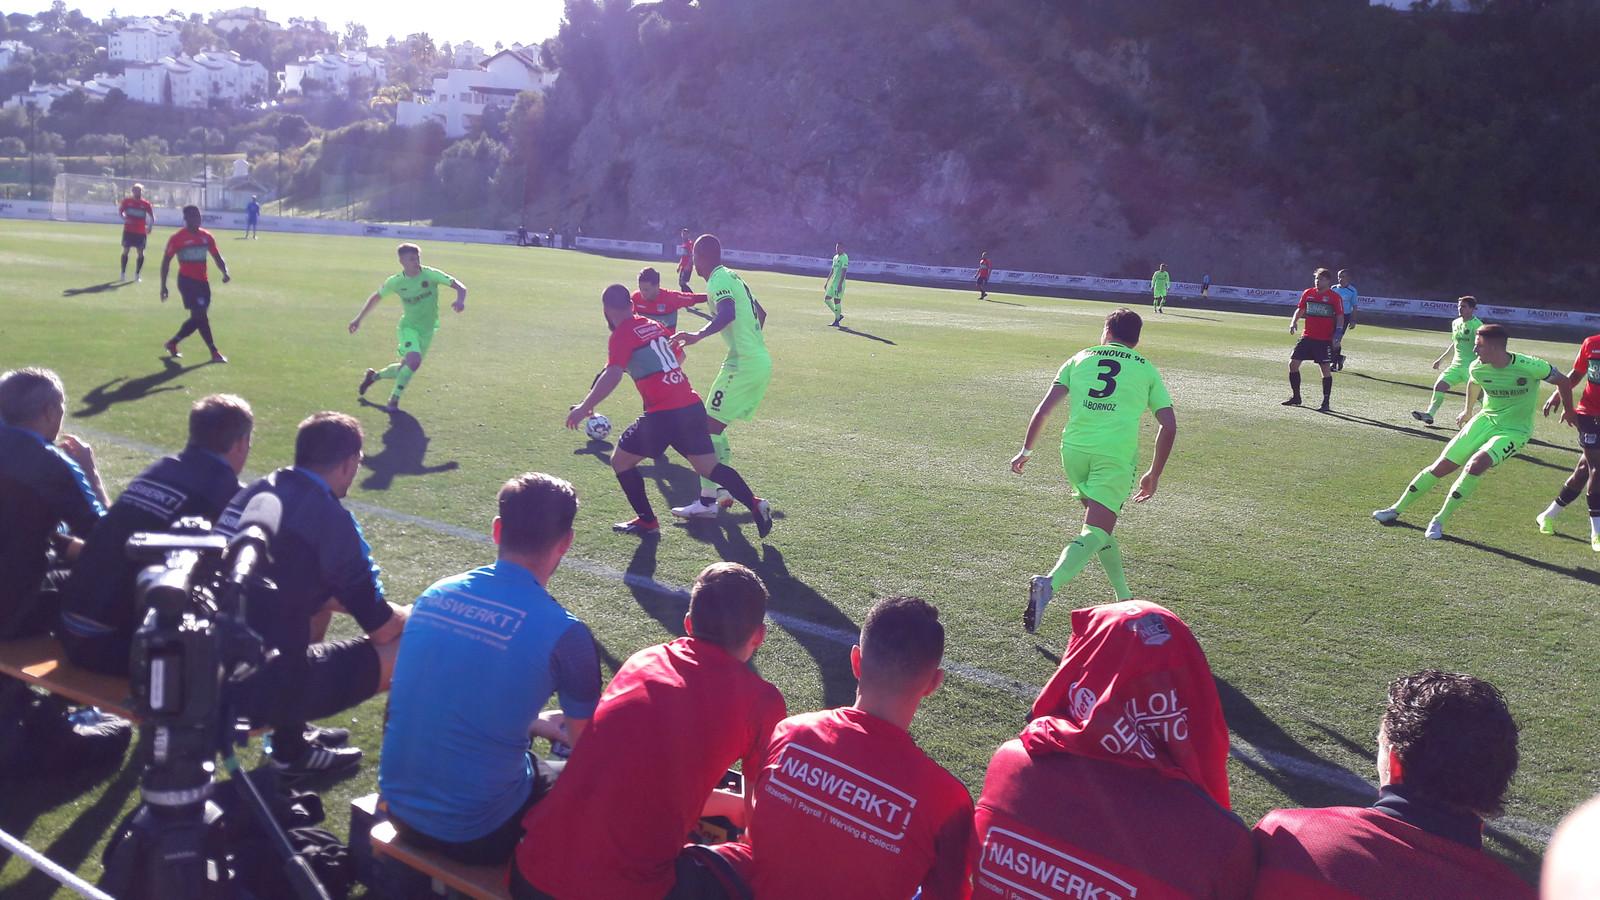 NEC in actie in Marbella